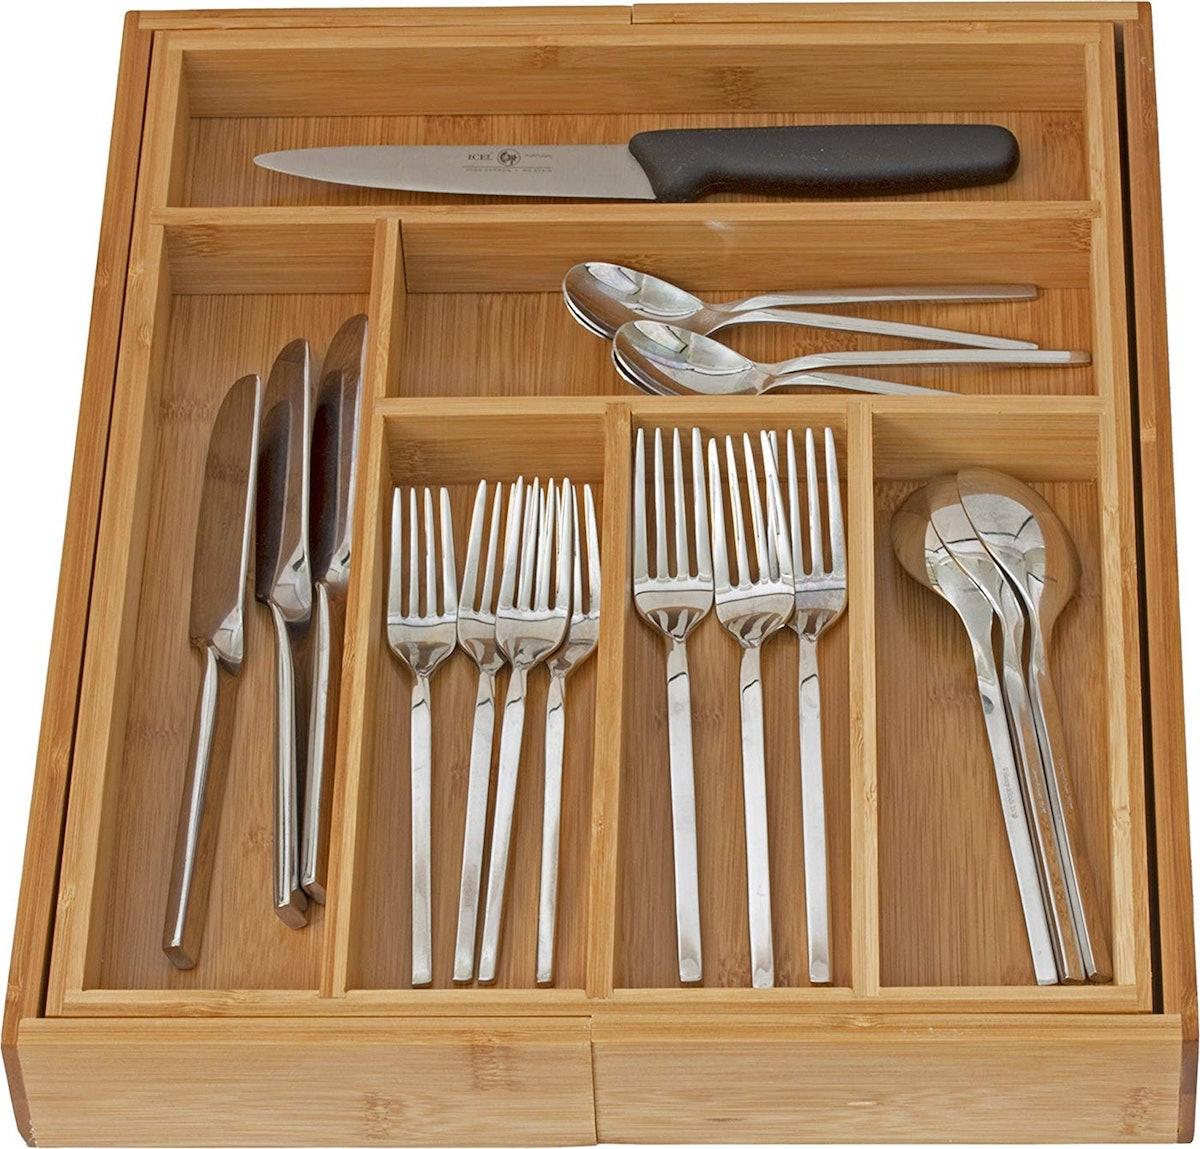 Home-it Drawer Organizer